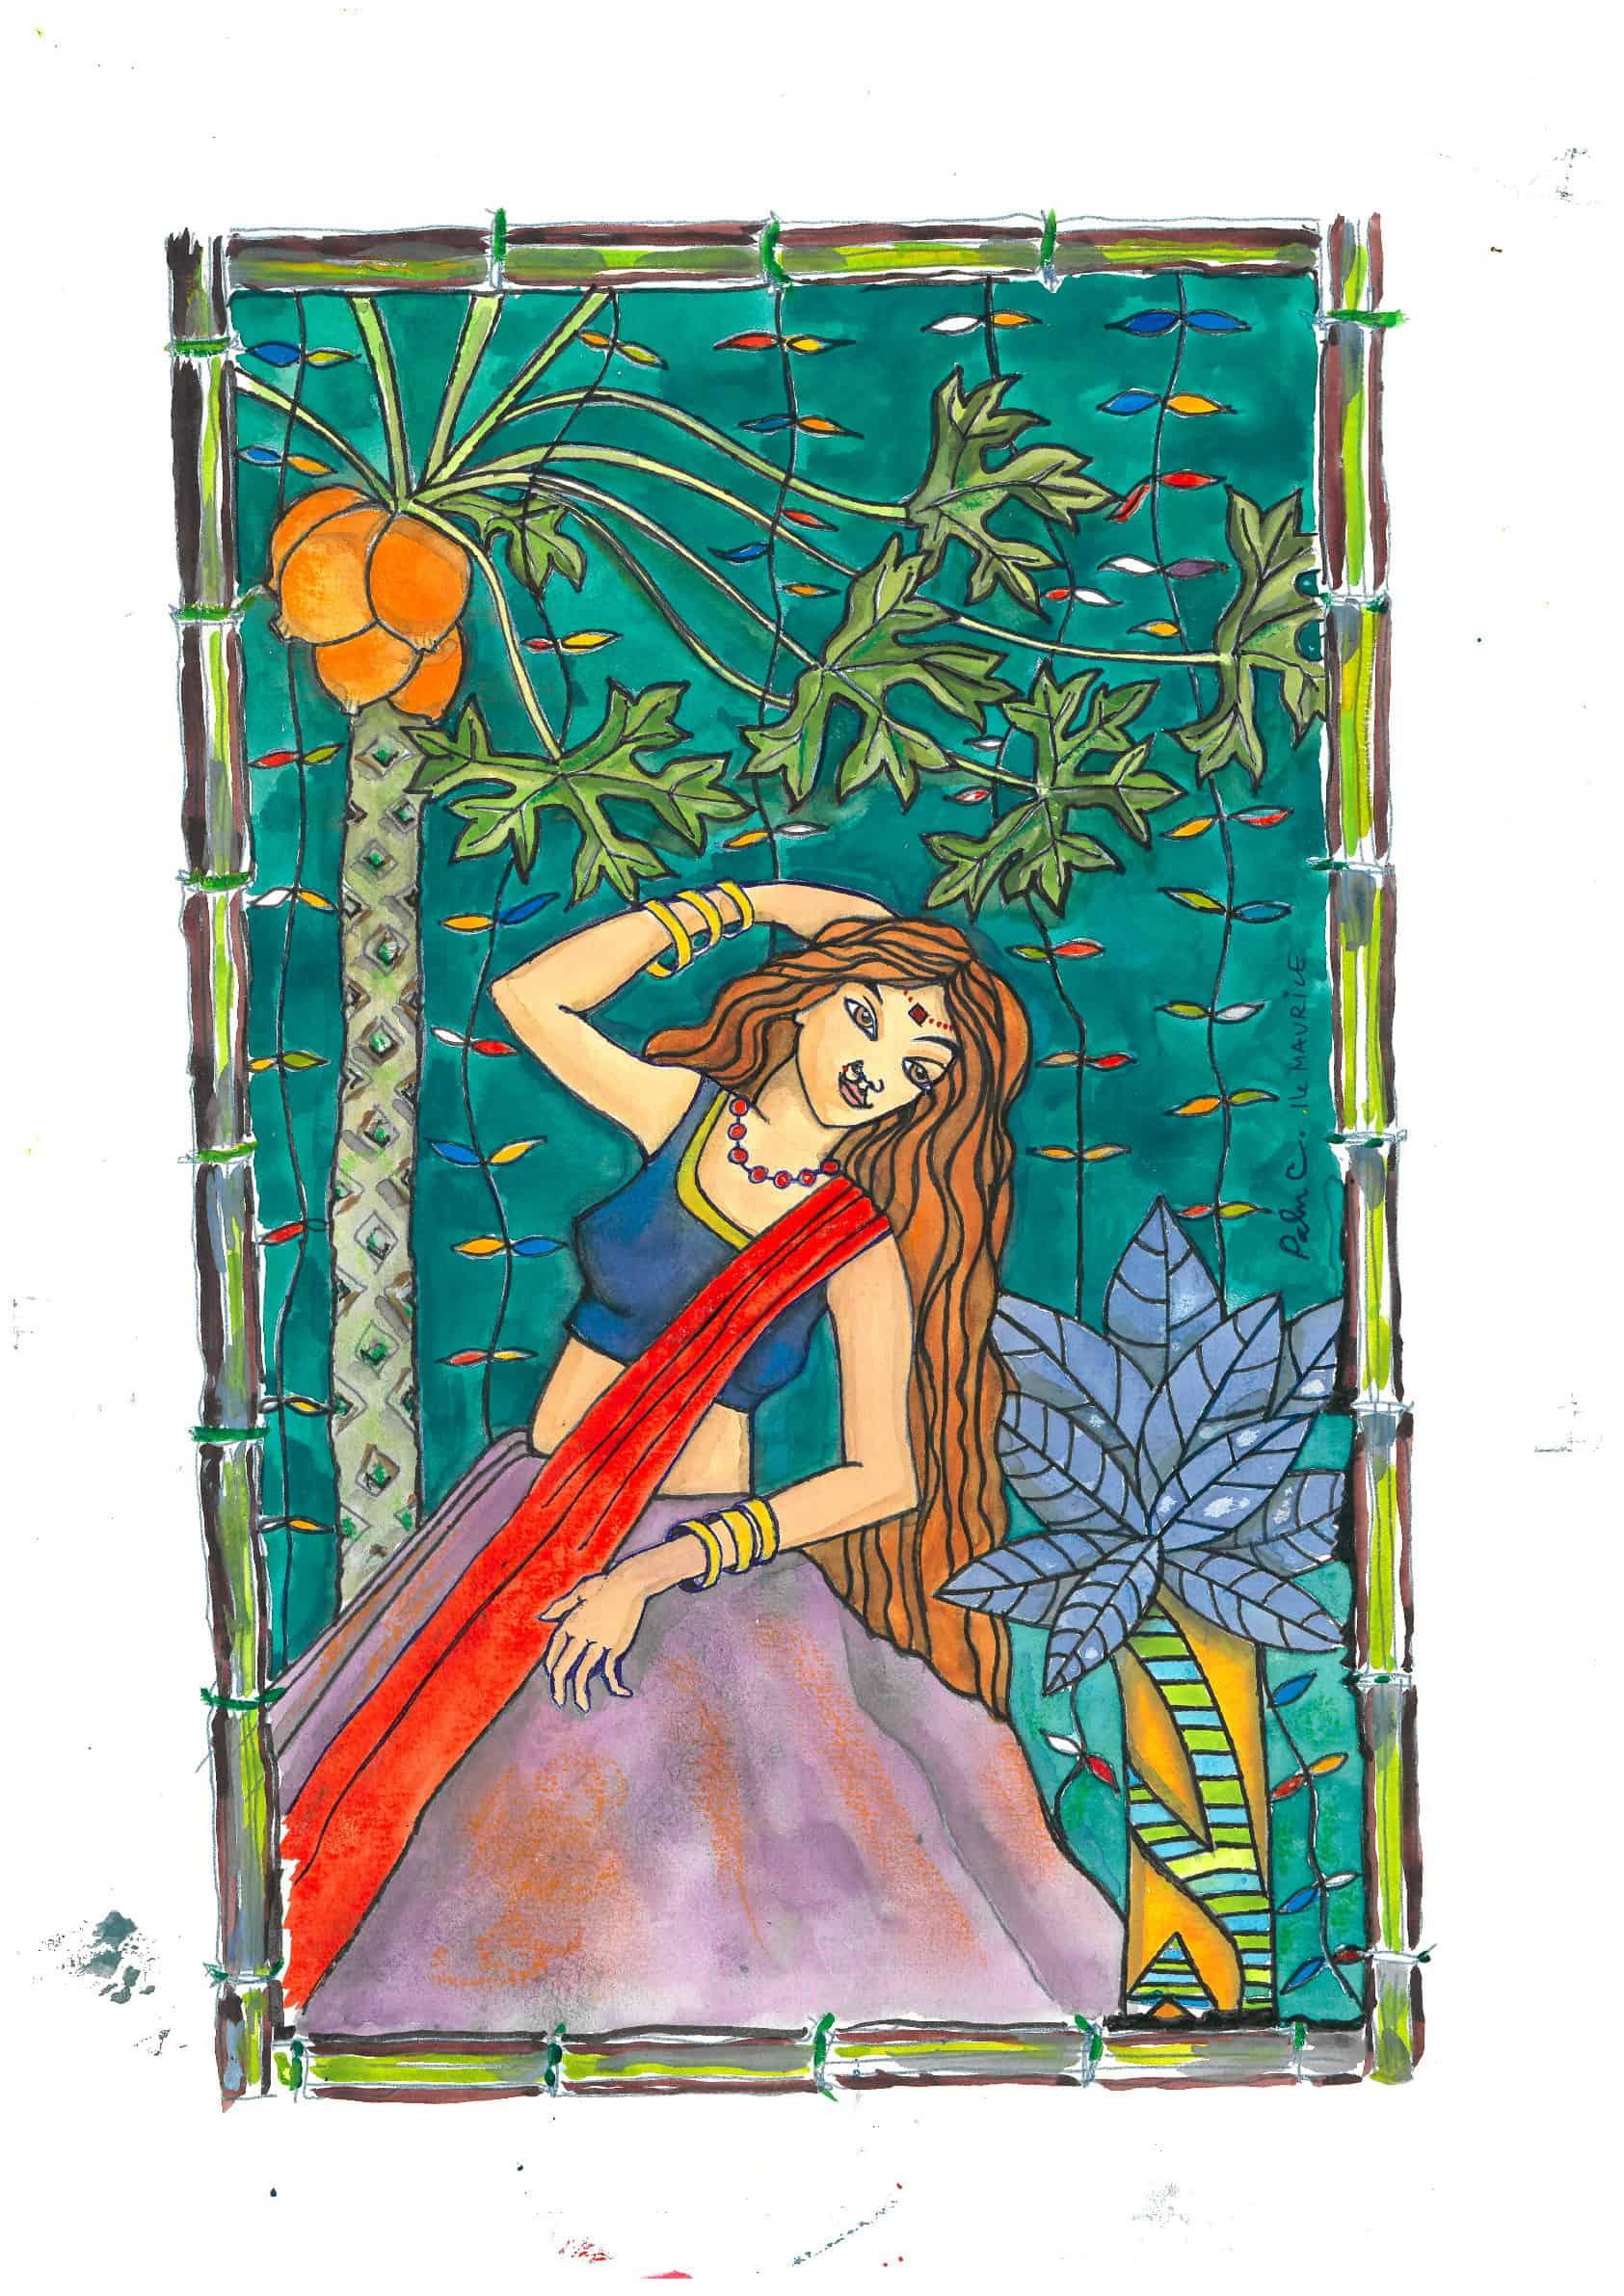 mauritius-art-palmesh-cuttaree-danceuse-1